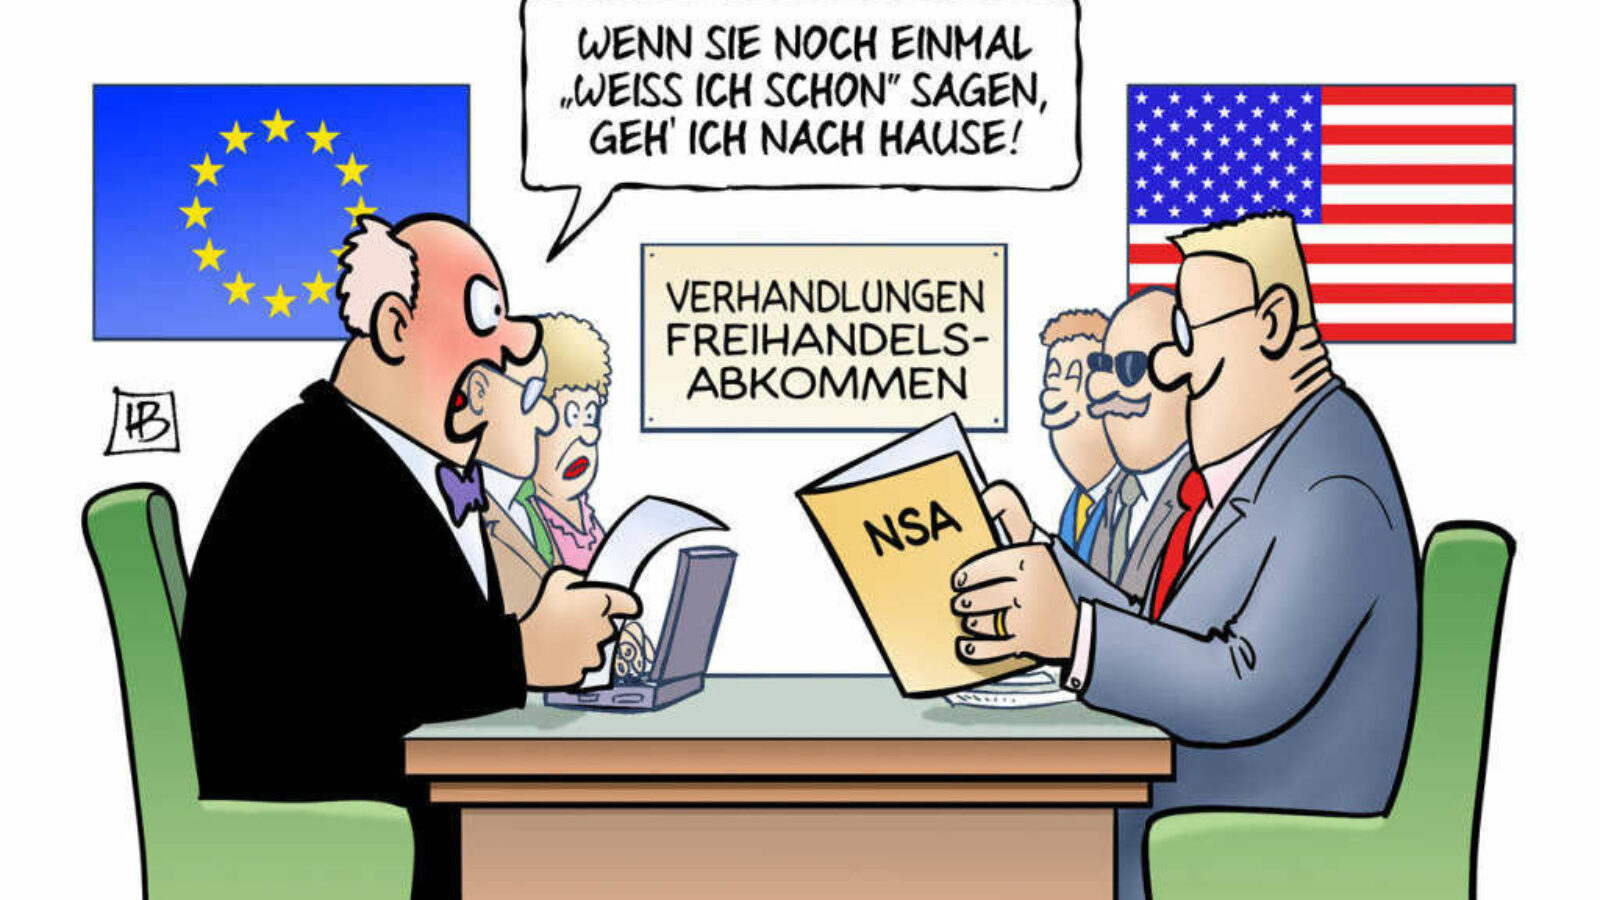 Freihandelsabkommen-FARBE